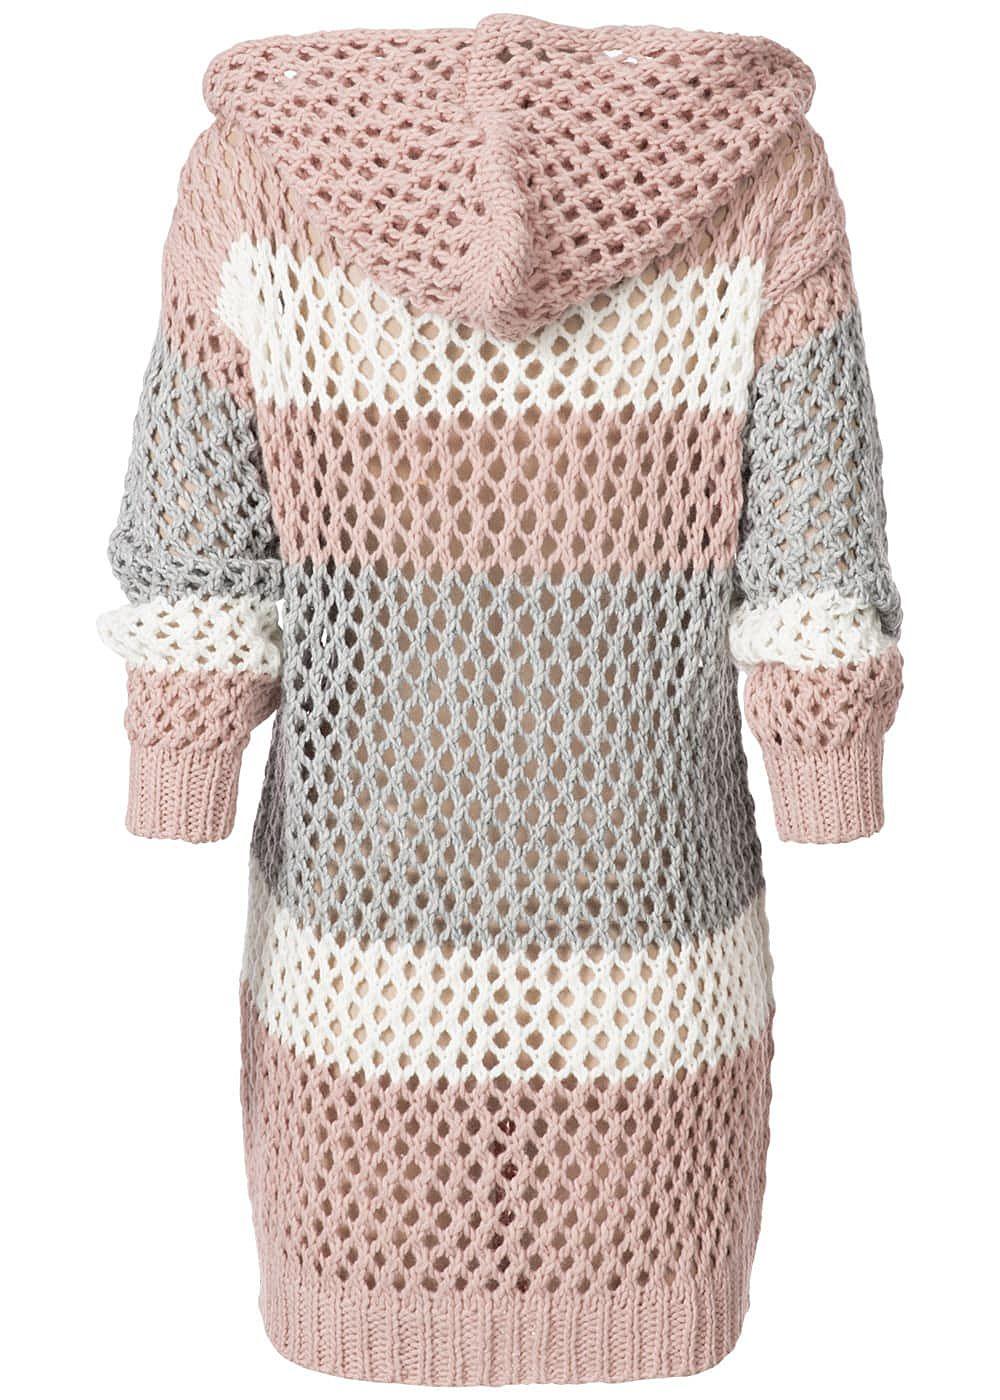 styleboom fashion damen grobstrick cardigan kapuze colorblock rosa grau weiss 77onlineshop. Black Bedroom Furniture Sets. Home Design Ideas